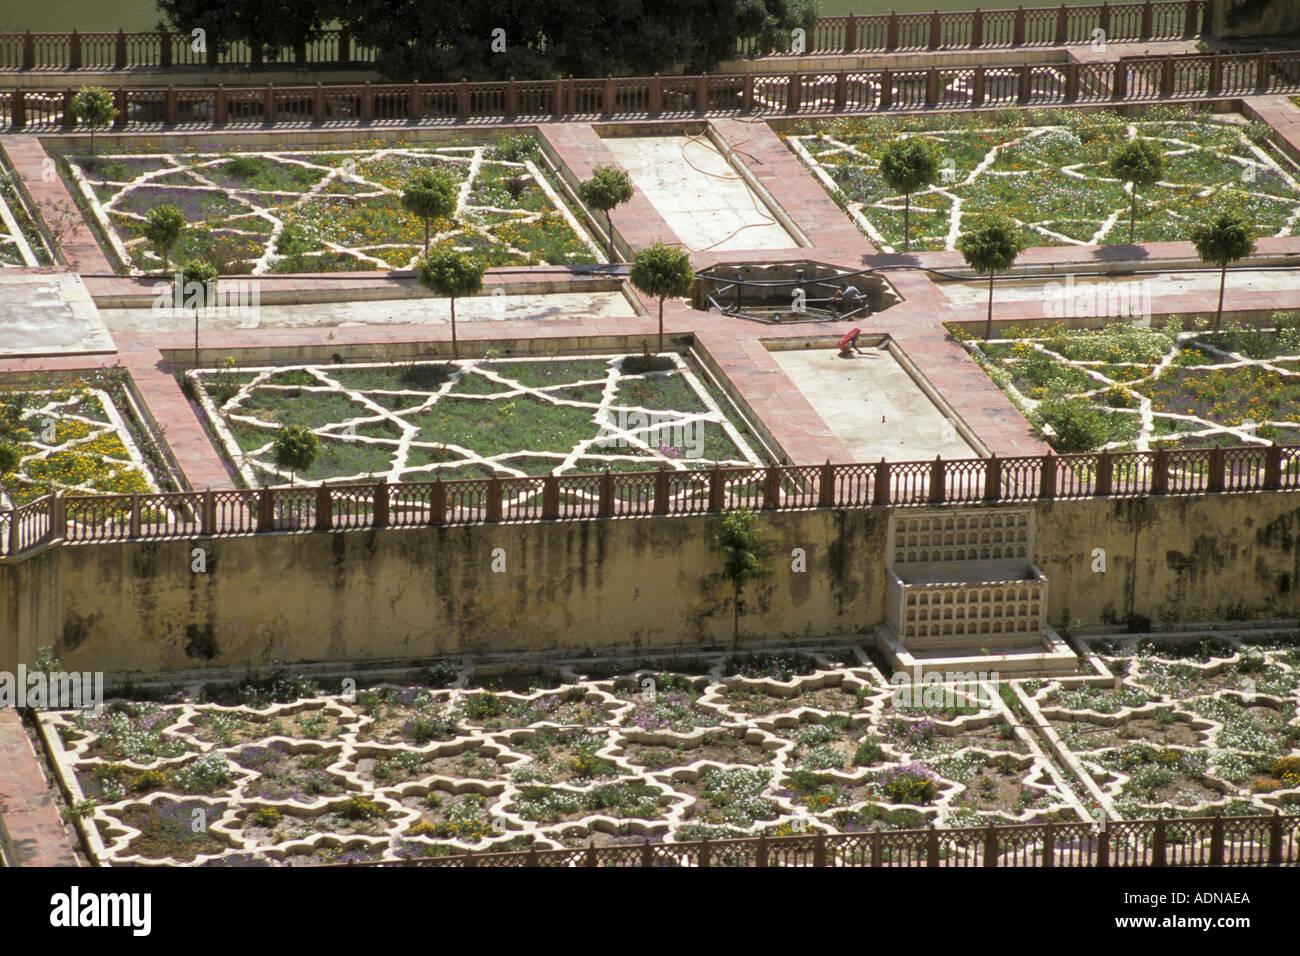 India Rajasthan Jaipur Amber Fort woman sweeping gardens Stock Photo ...